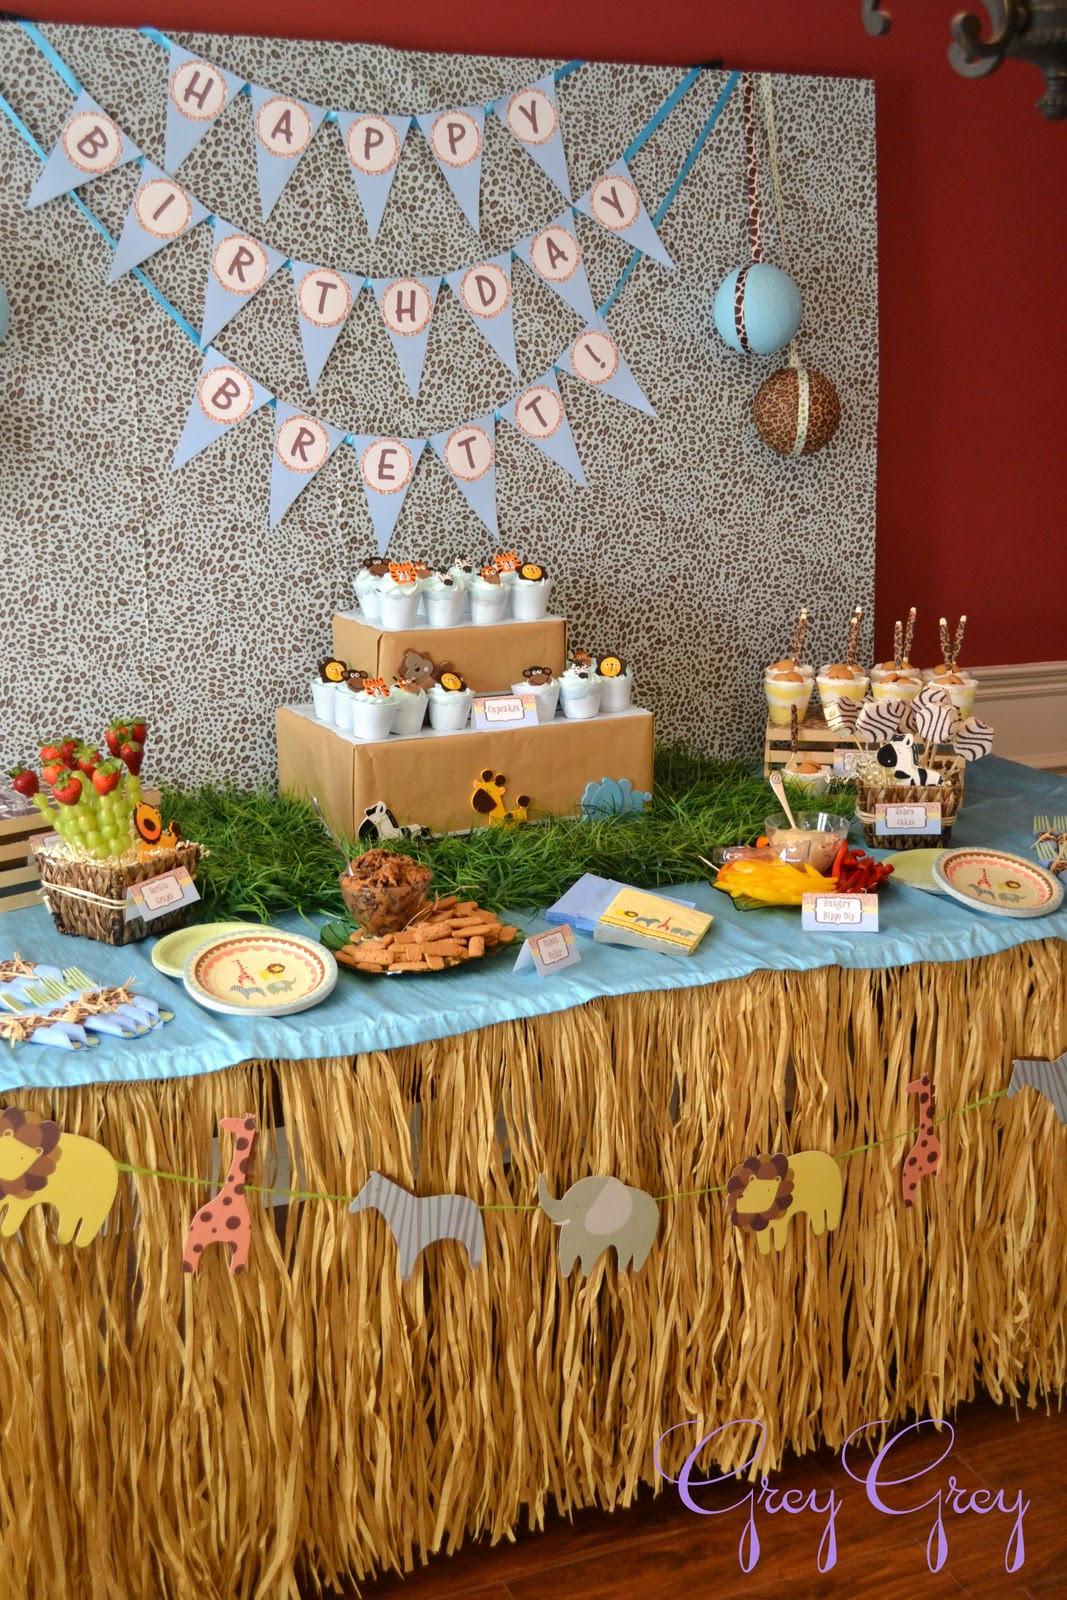 Best ideas about Safari Birthday Decorations . Save or Pin GreyGrey Designs My Parties Brett s Jungle Safari 1st Now.